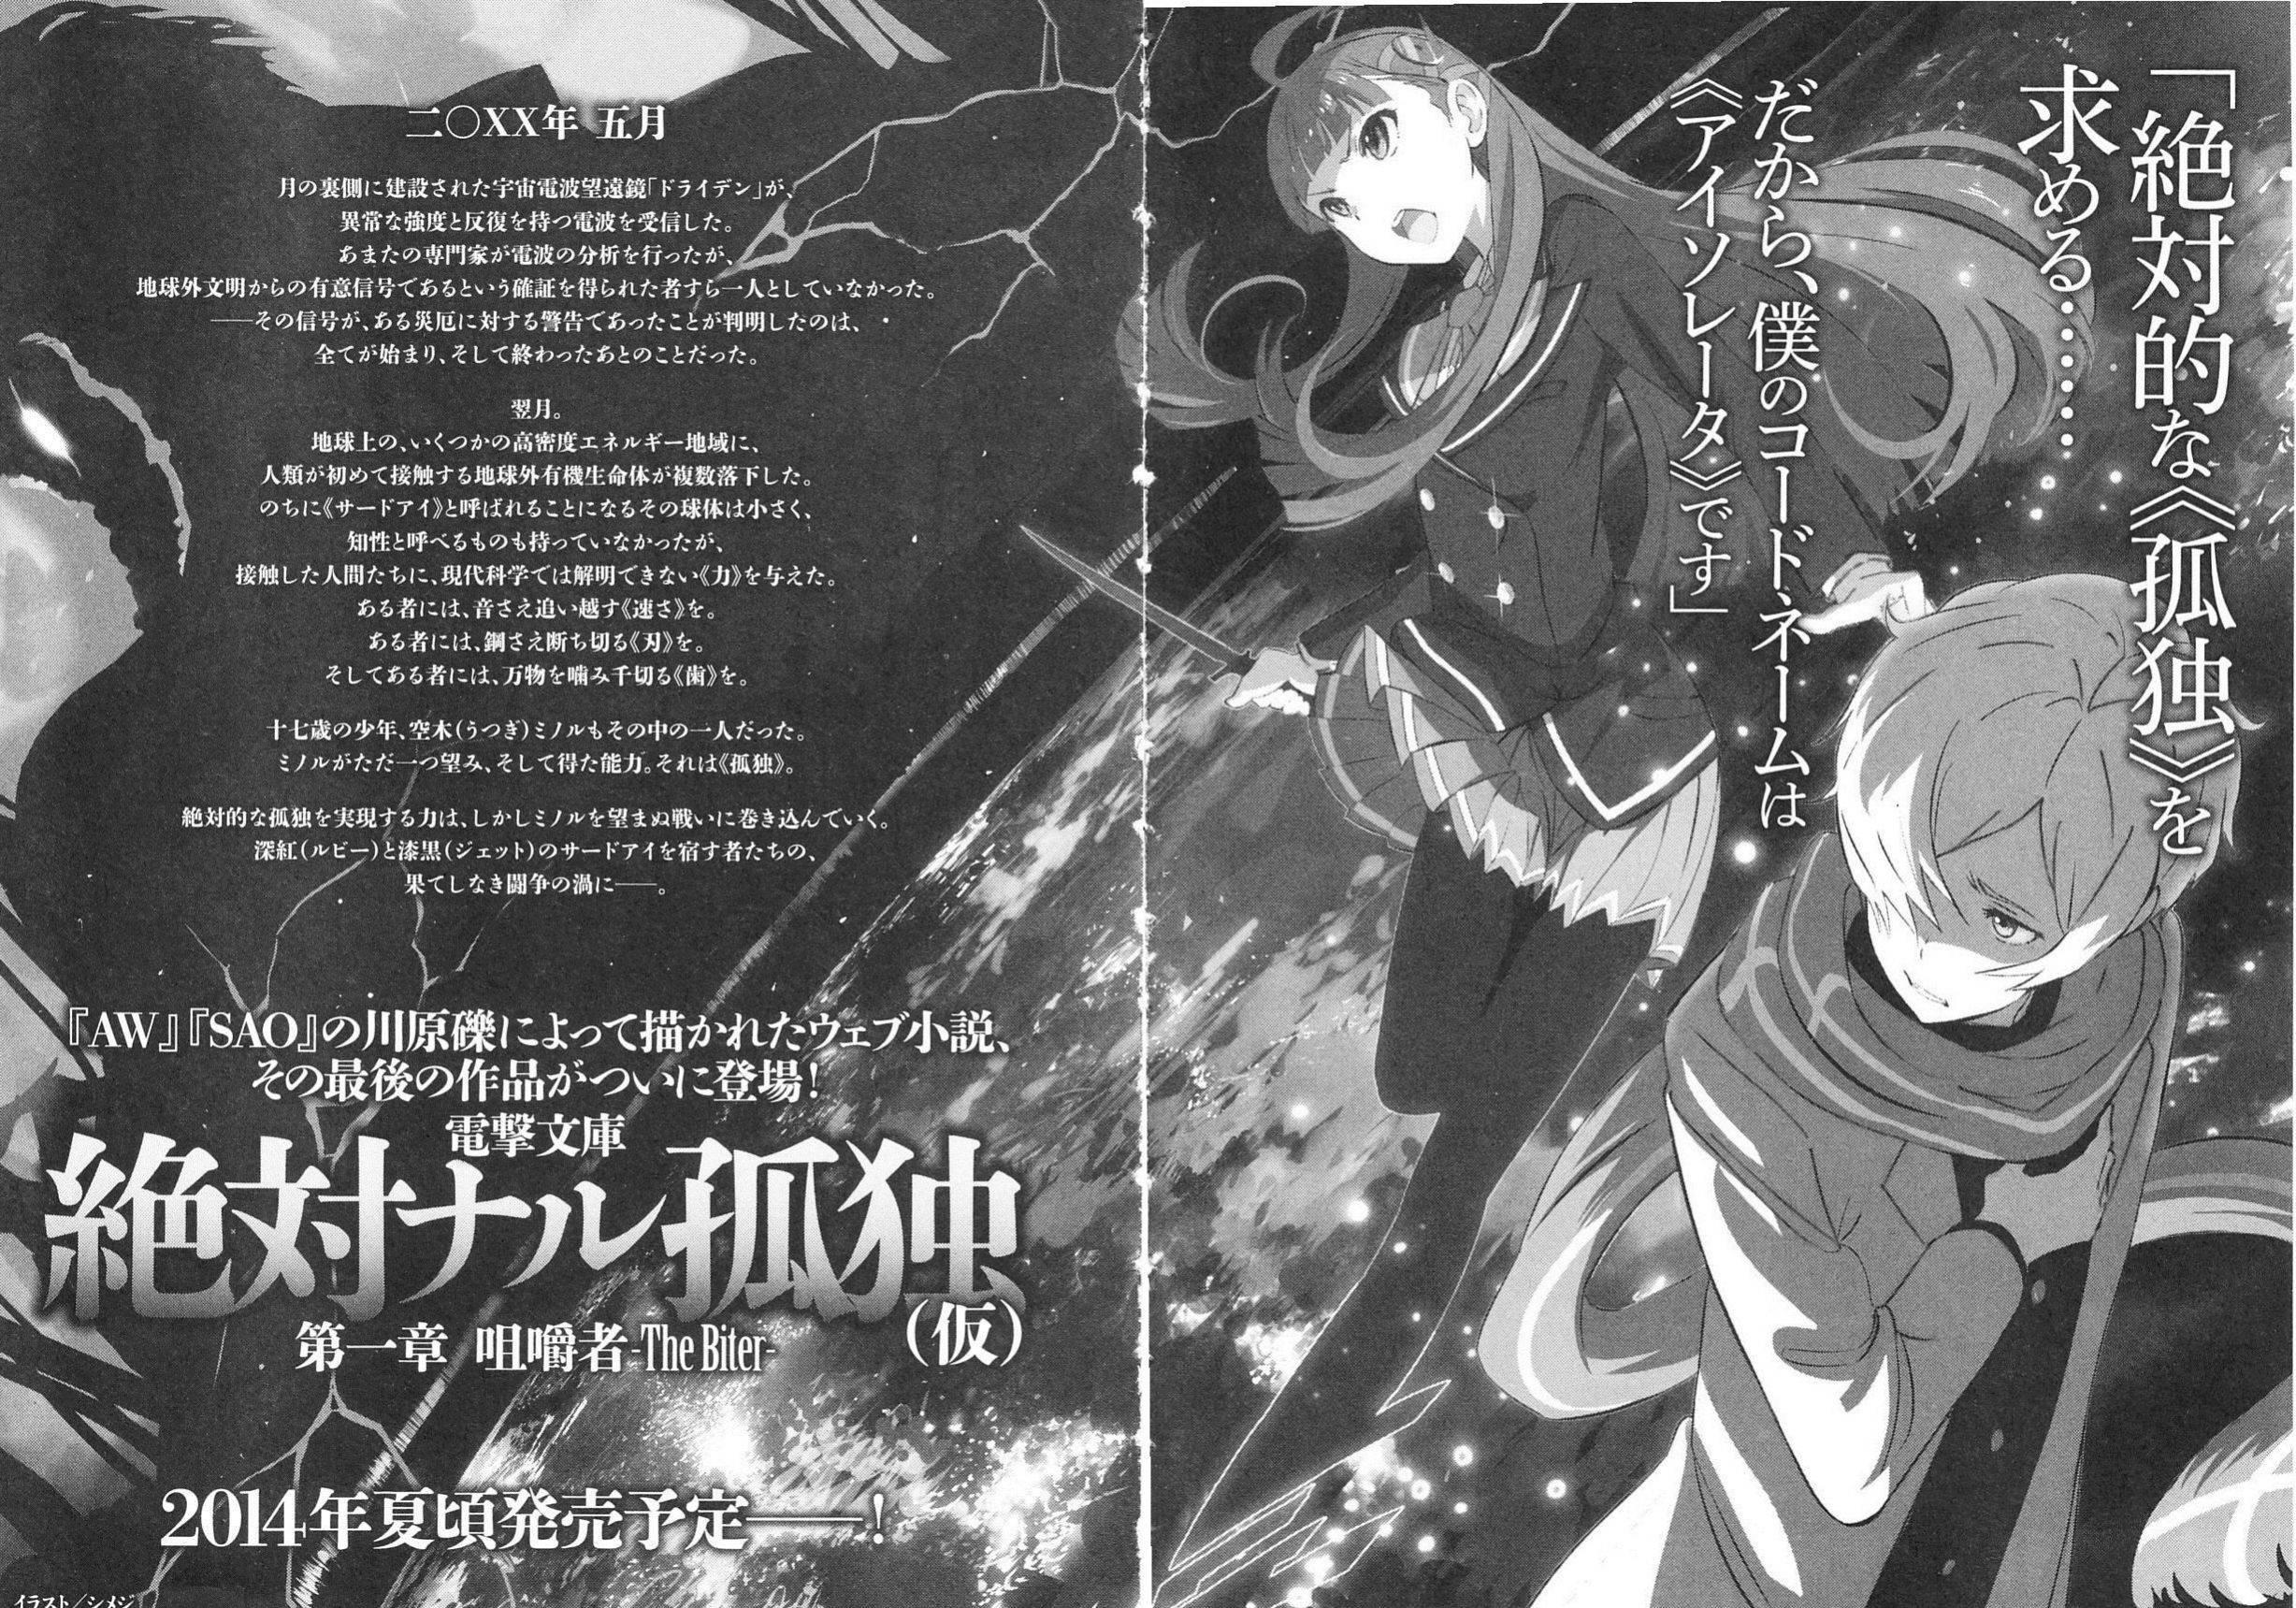 Reki Kawaharas Zettai Naru Kodoku (Absolute Solitude) Light Novel Launches in June image 3